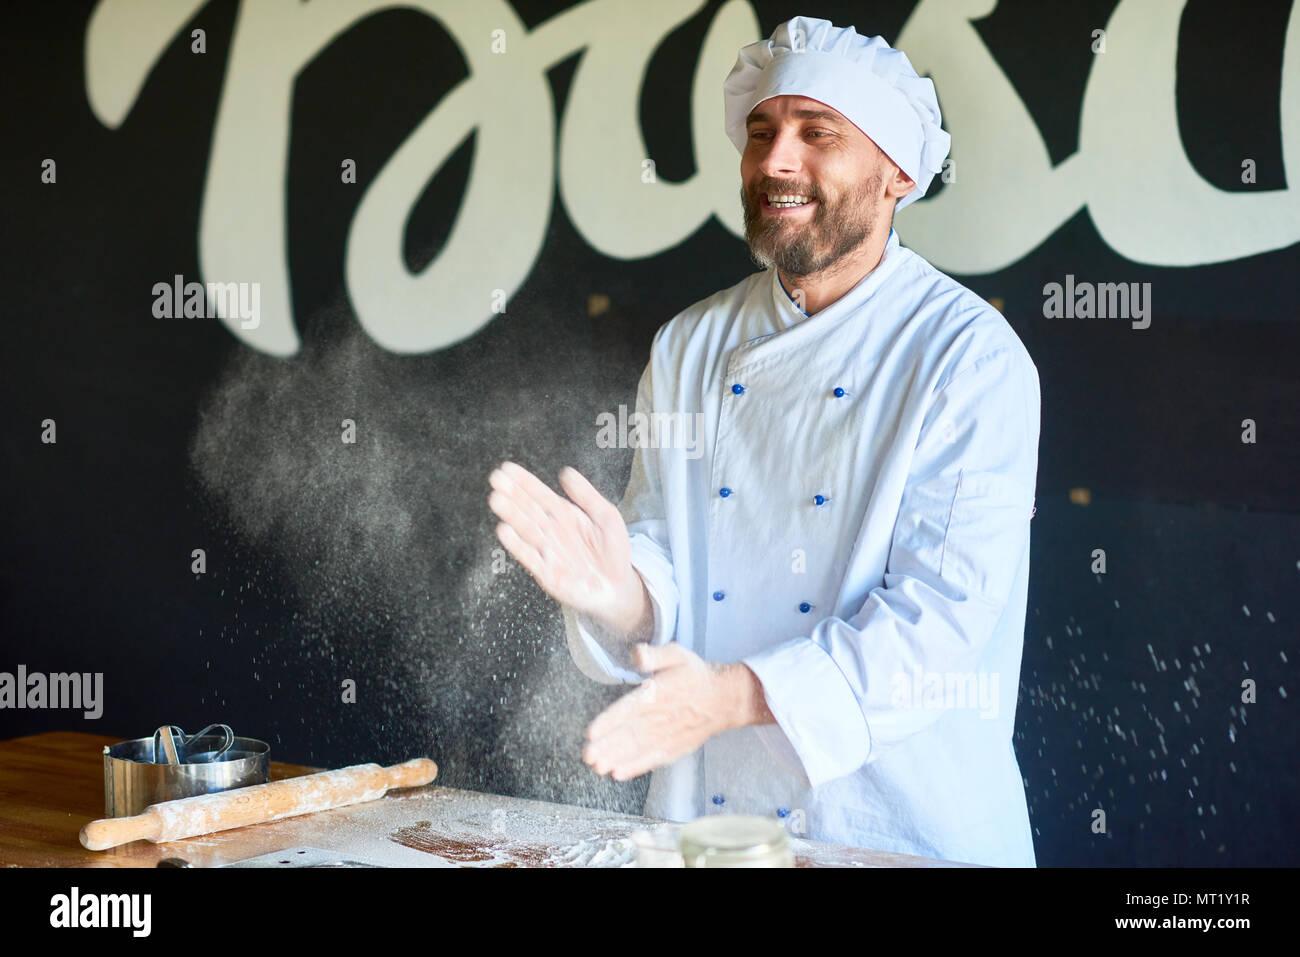 Baker in cucina Immagini Stock